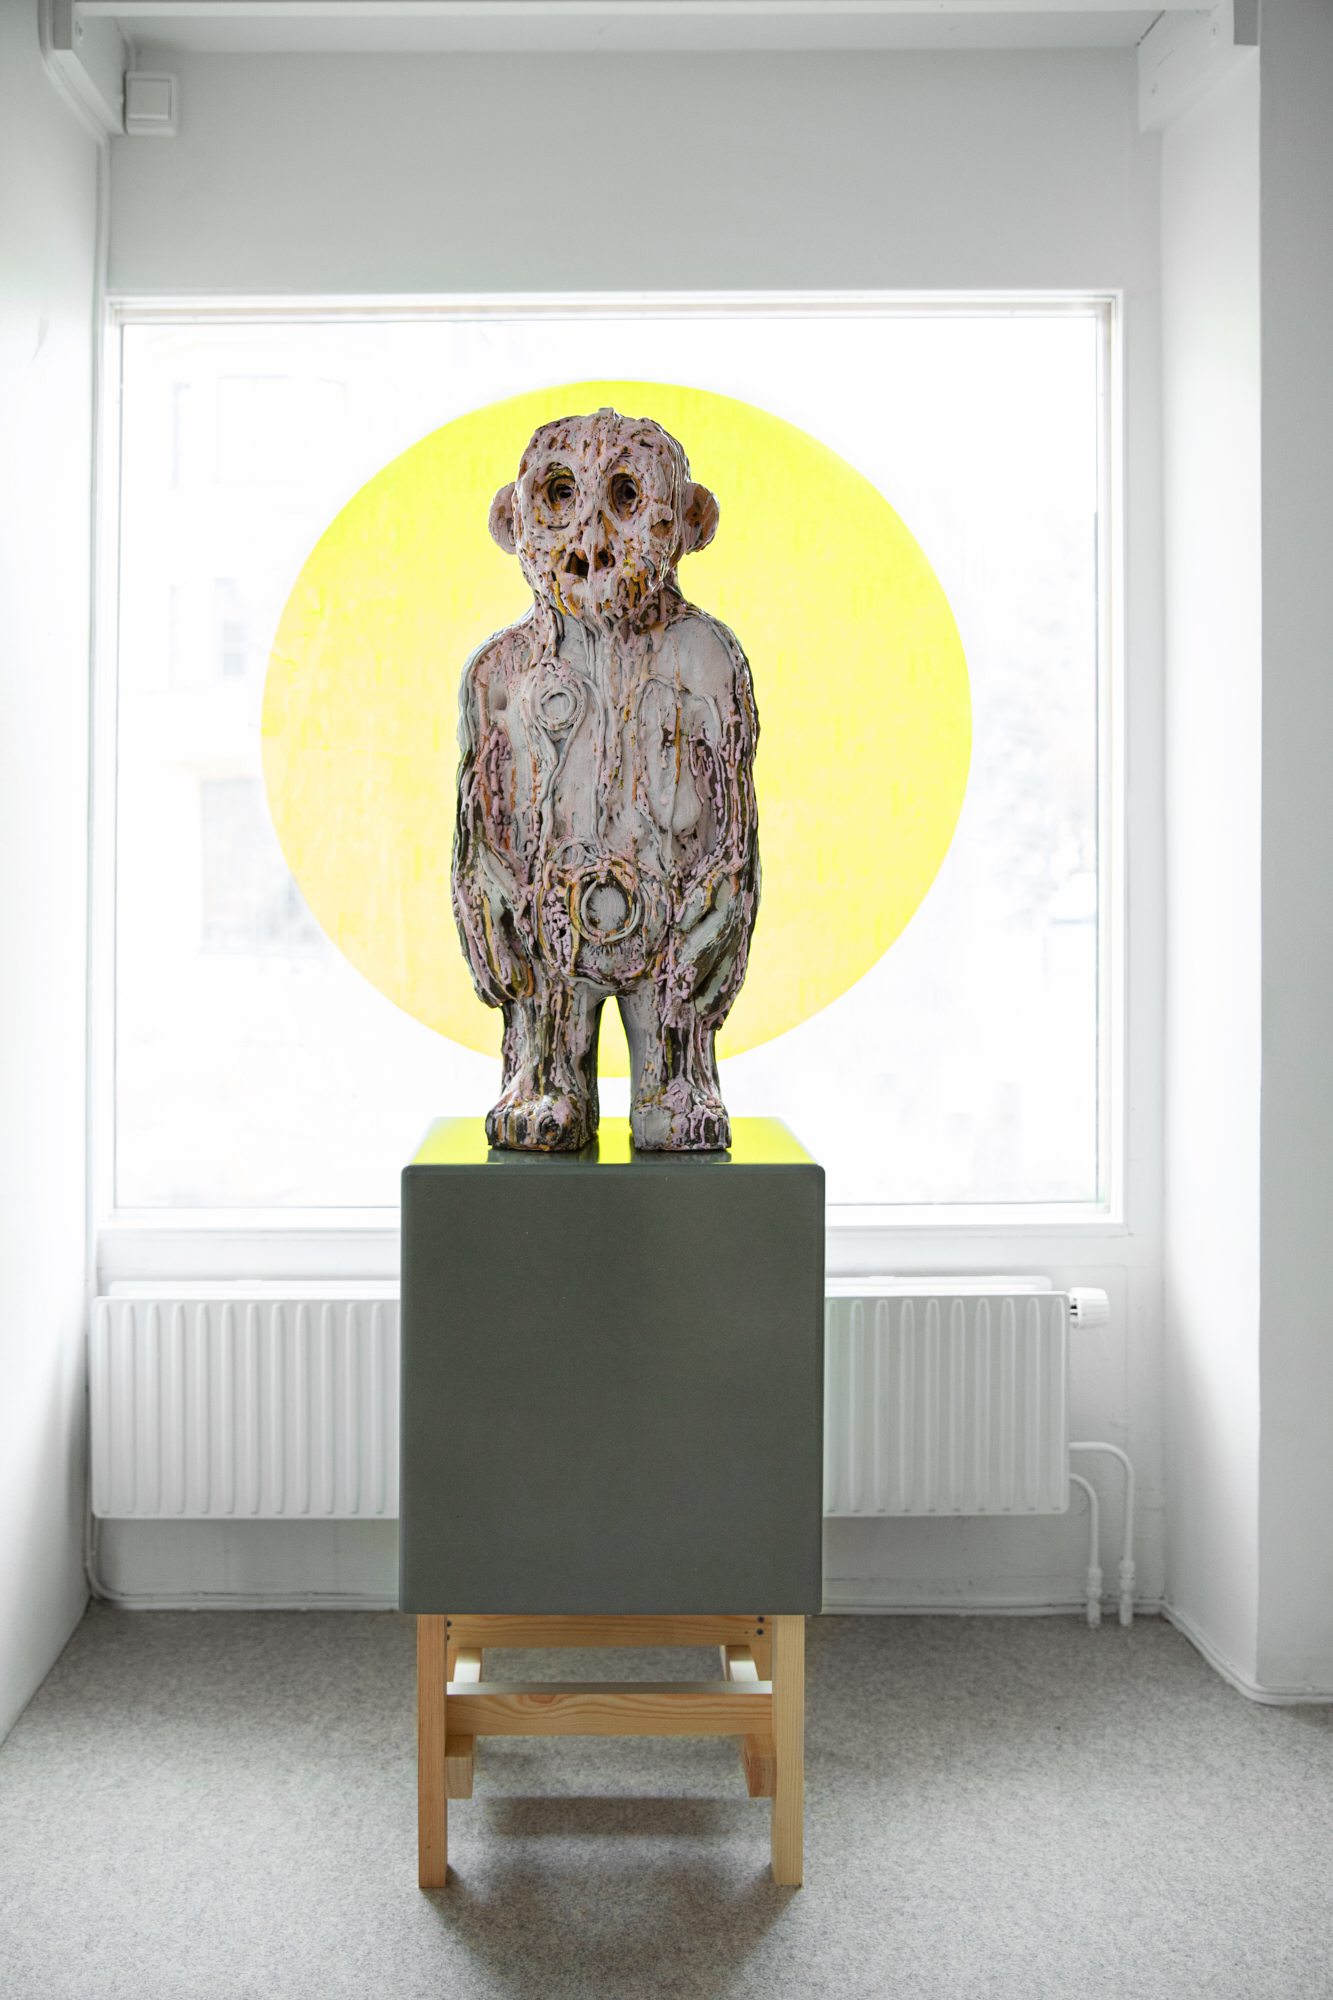 (smiling) faces, Carl Richard Söderström, Hollow Mind, sculptuur, 2020. Foto Sanna Lindberg, keramiek, glazuur, verf, tentoonstelling